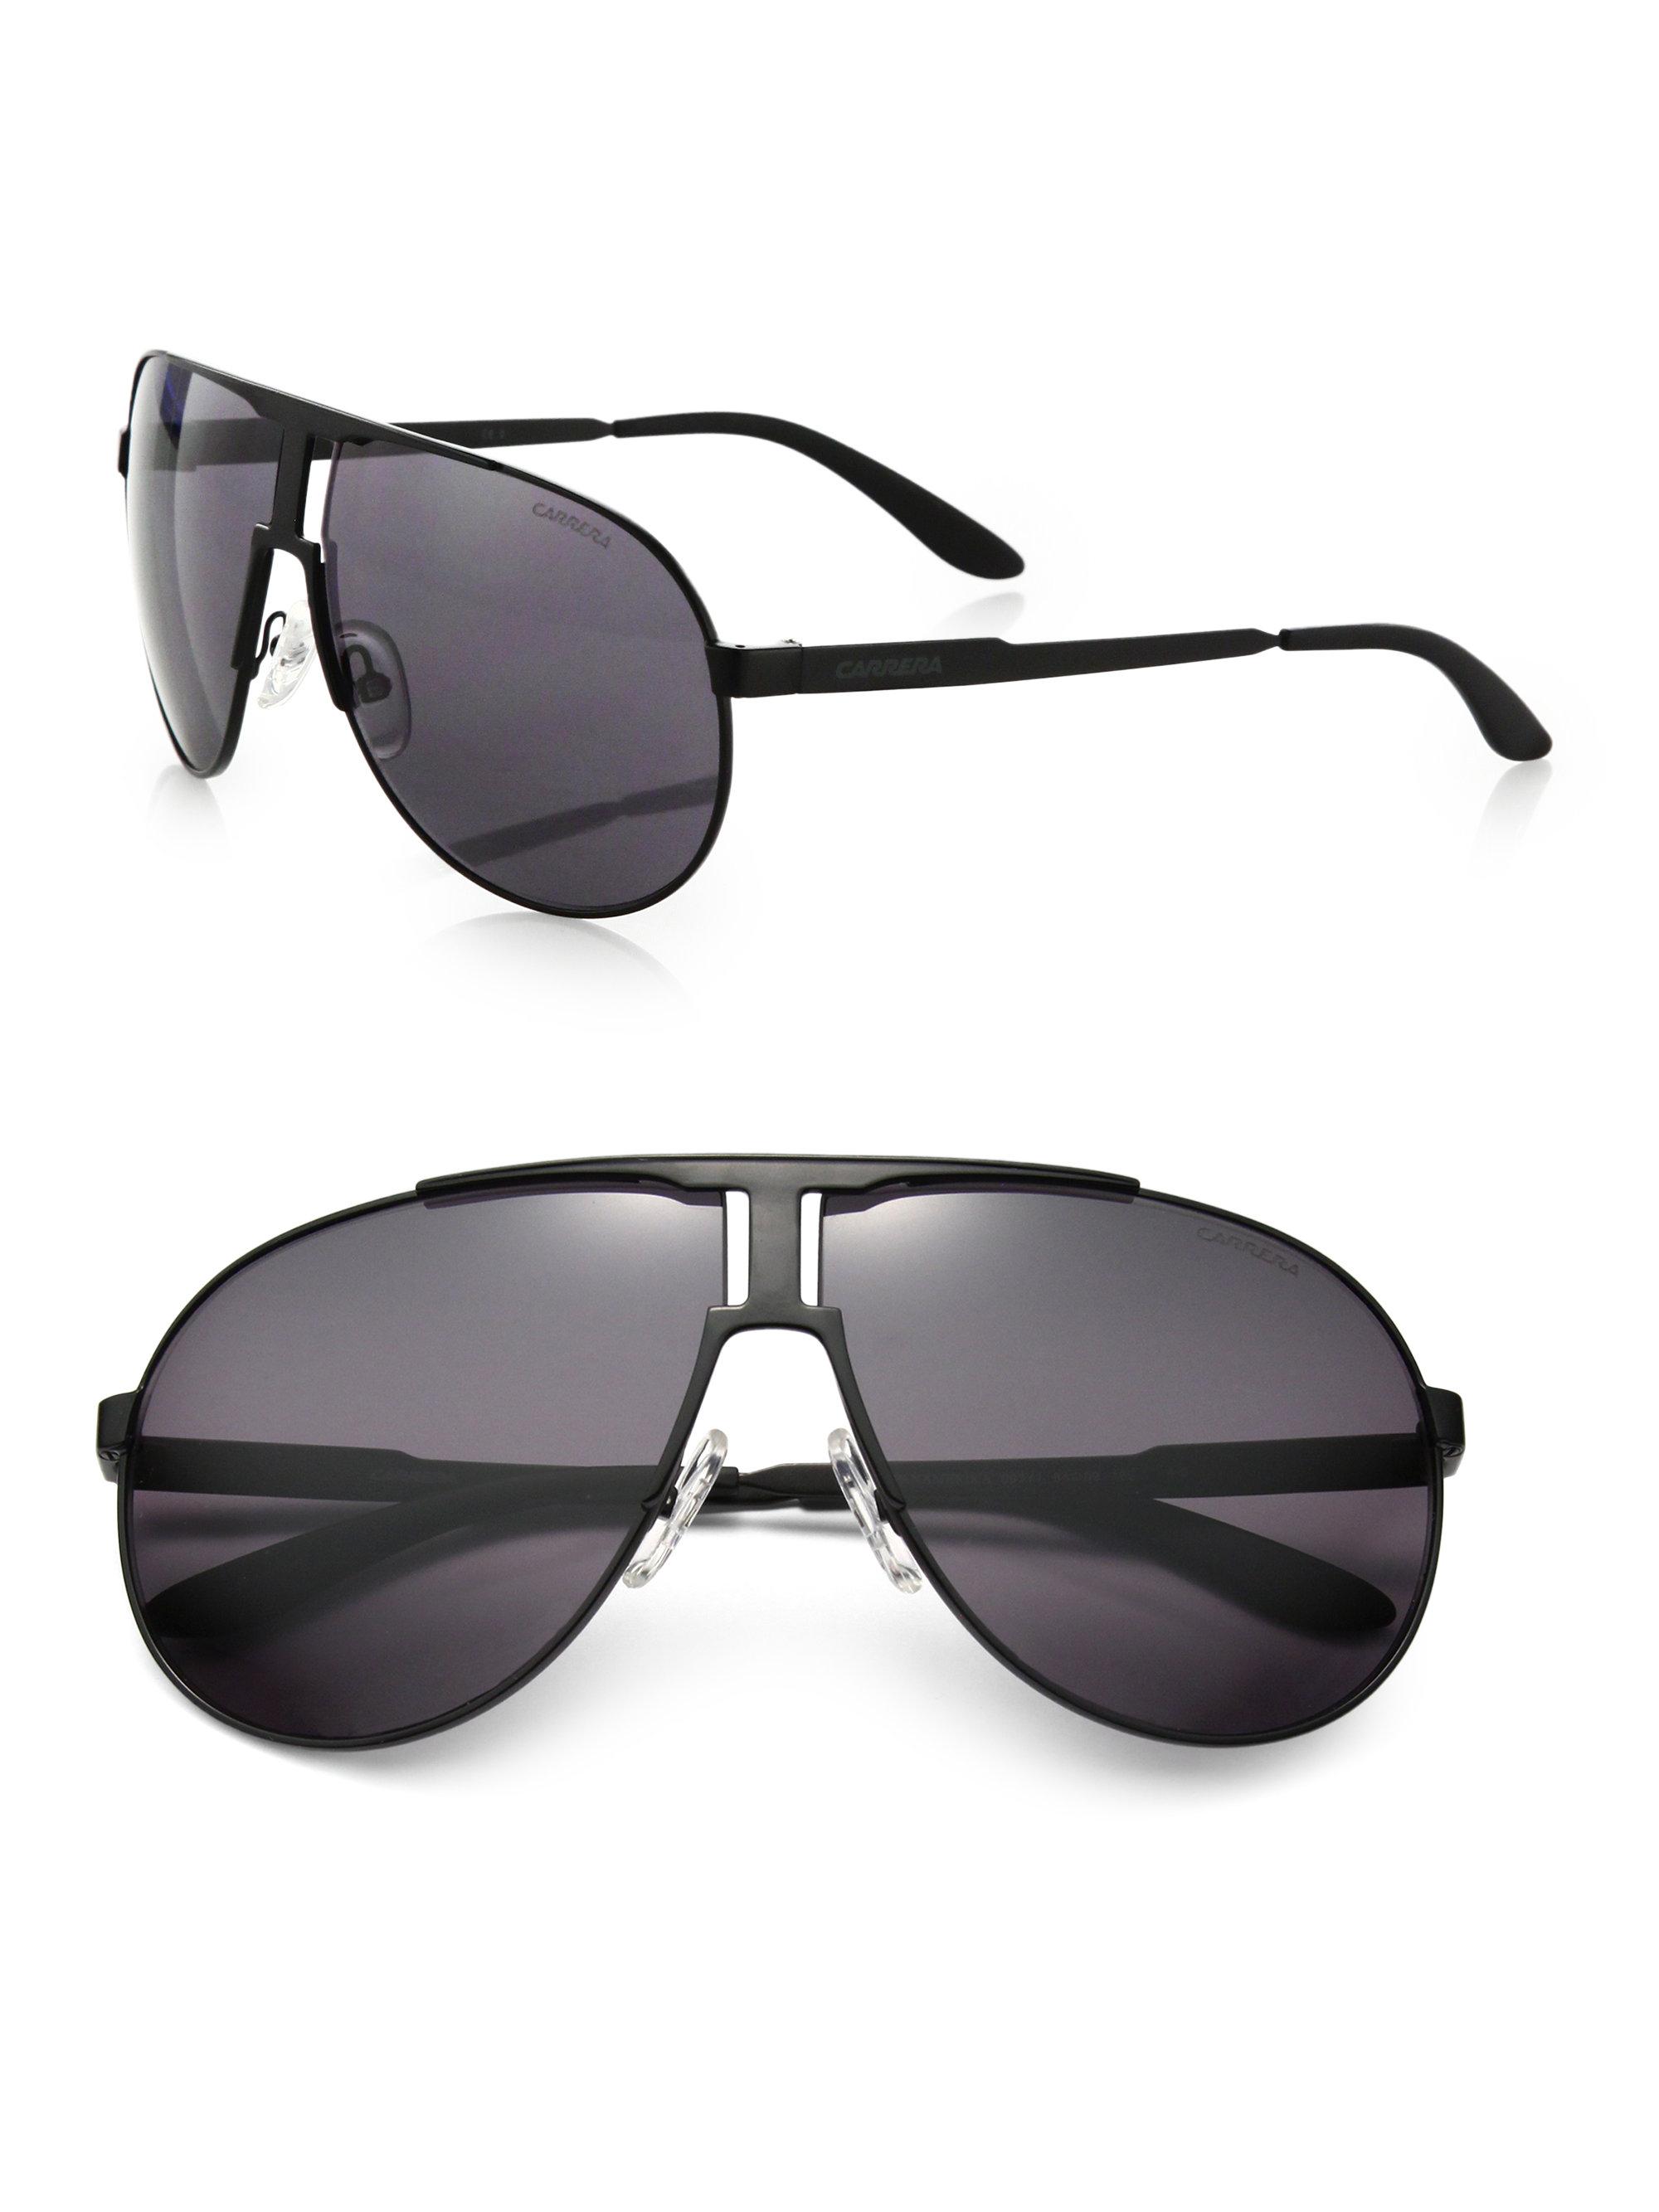 4e8f4af00ba8 Lyst - Carrera New Panamer 64Mm Aviator Sunglasses in Black for Men